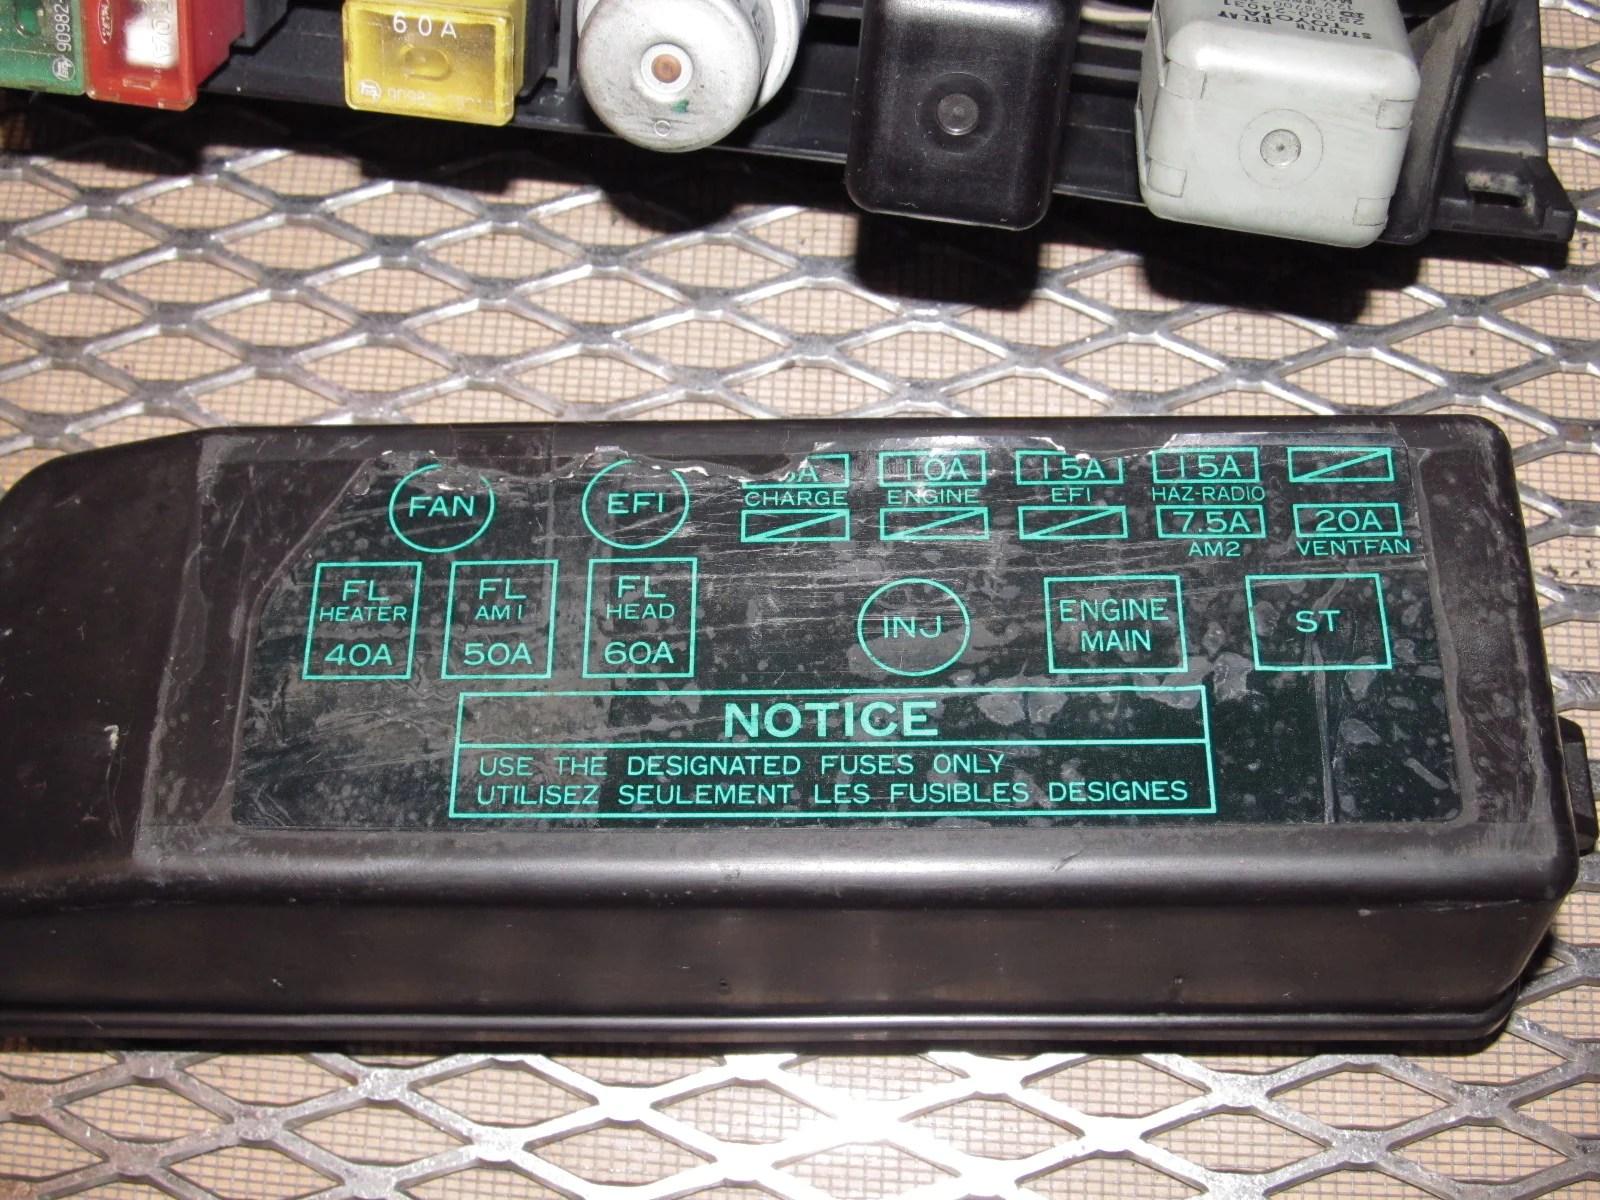 toyota mr2 mk1 fuse box wiring diagrams lol toyota mk1 mk1 mr2 fuse box [ 1600 x 1200 Pixel ]